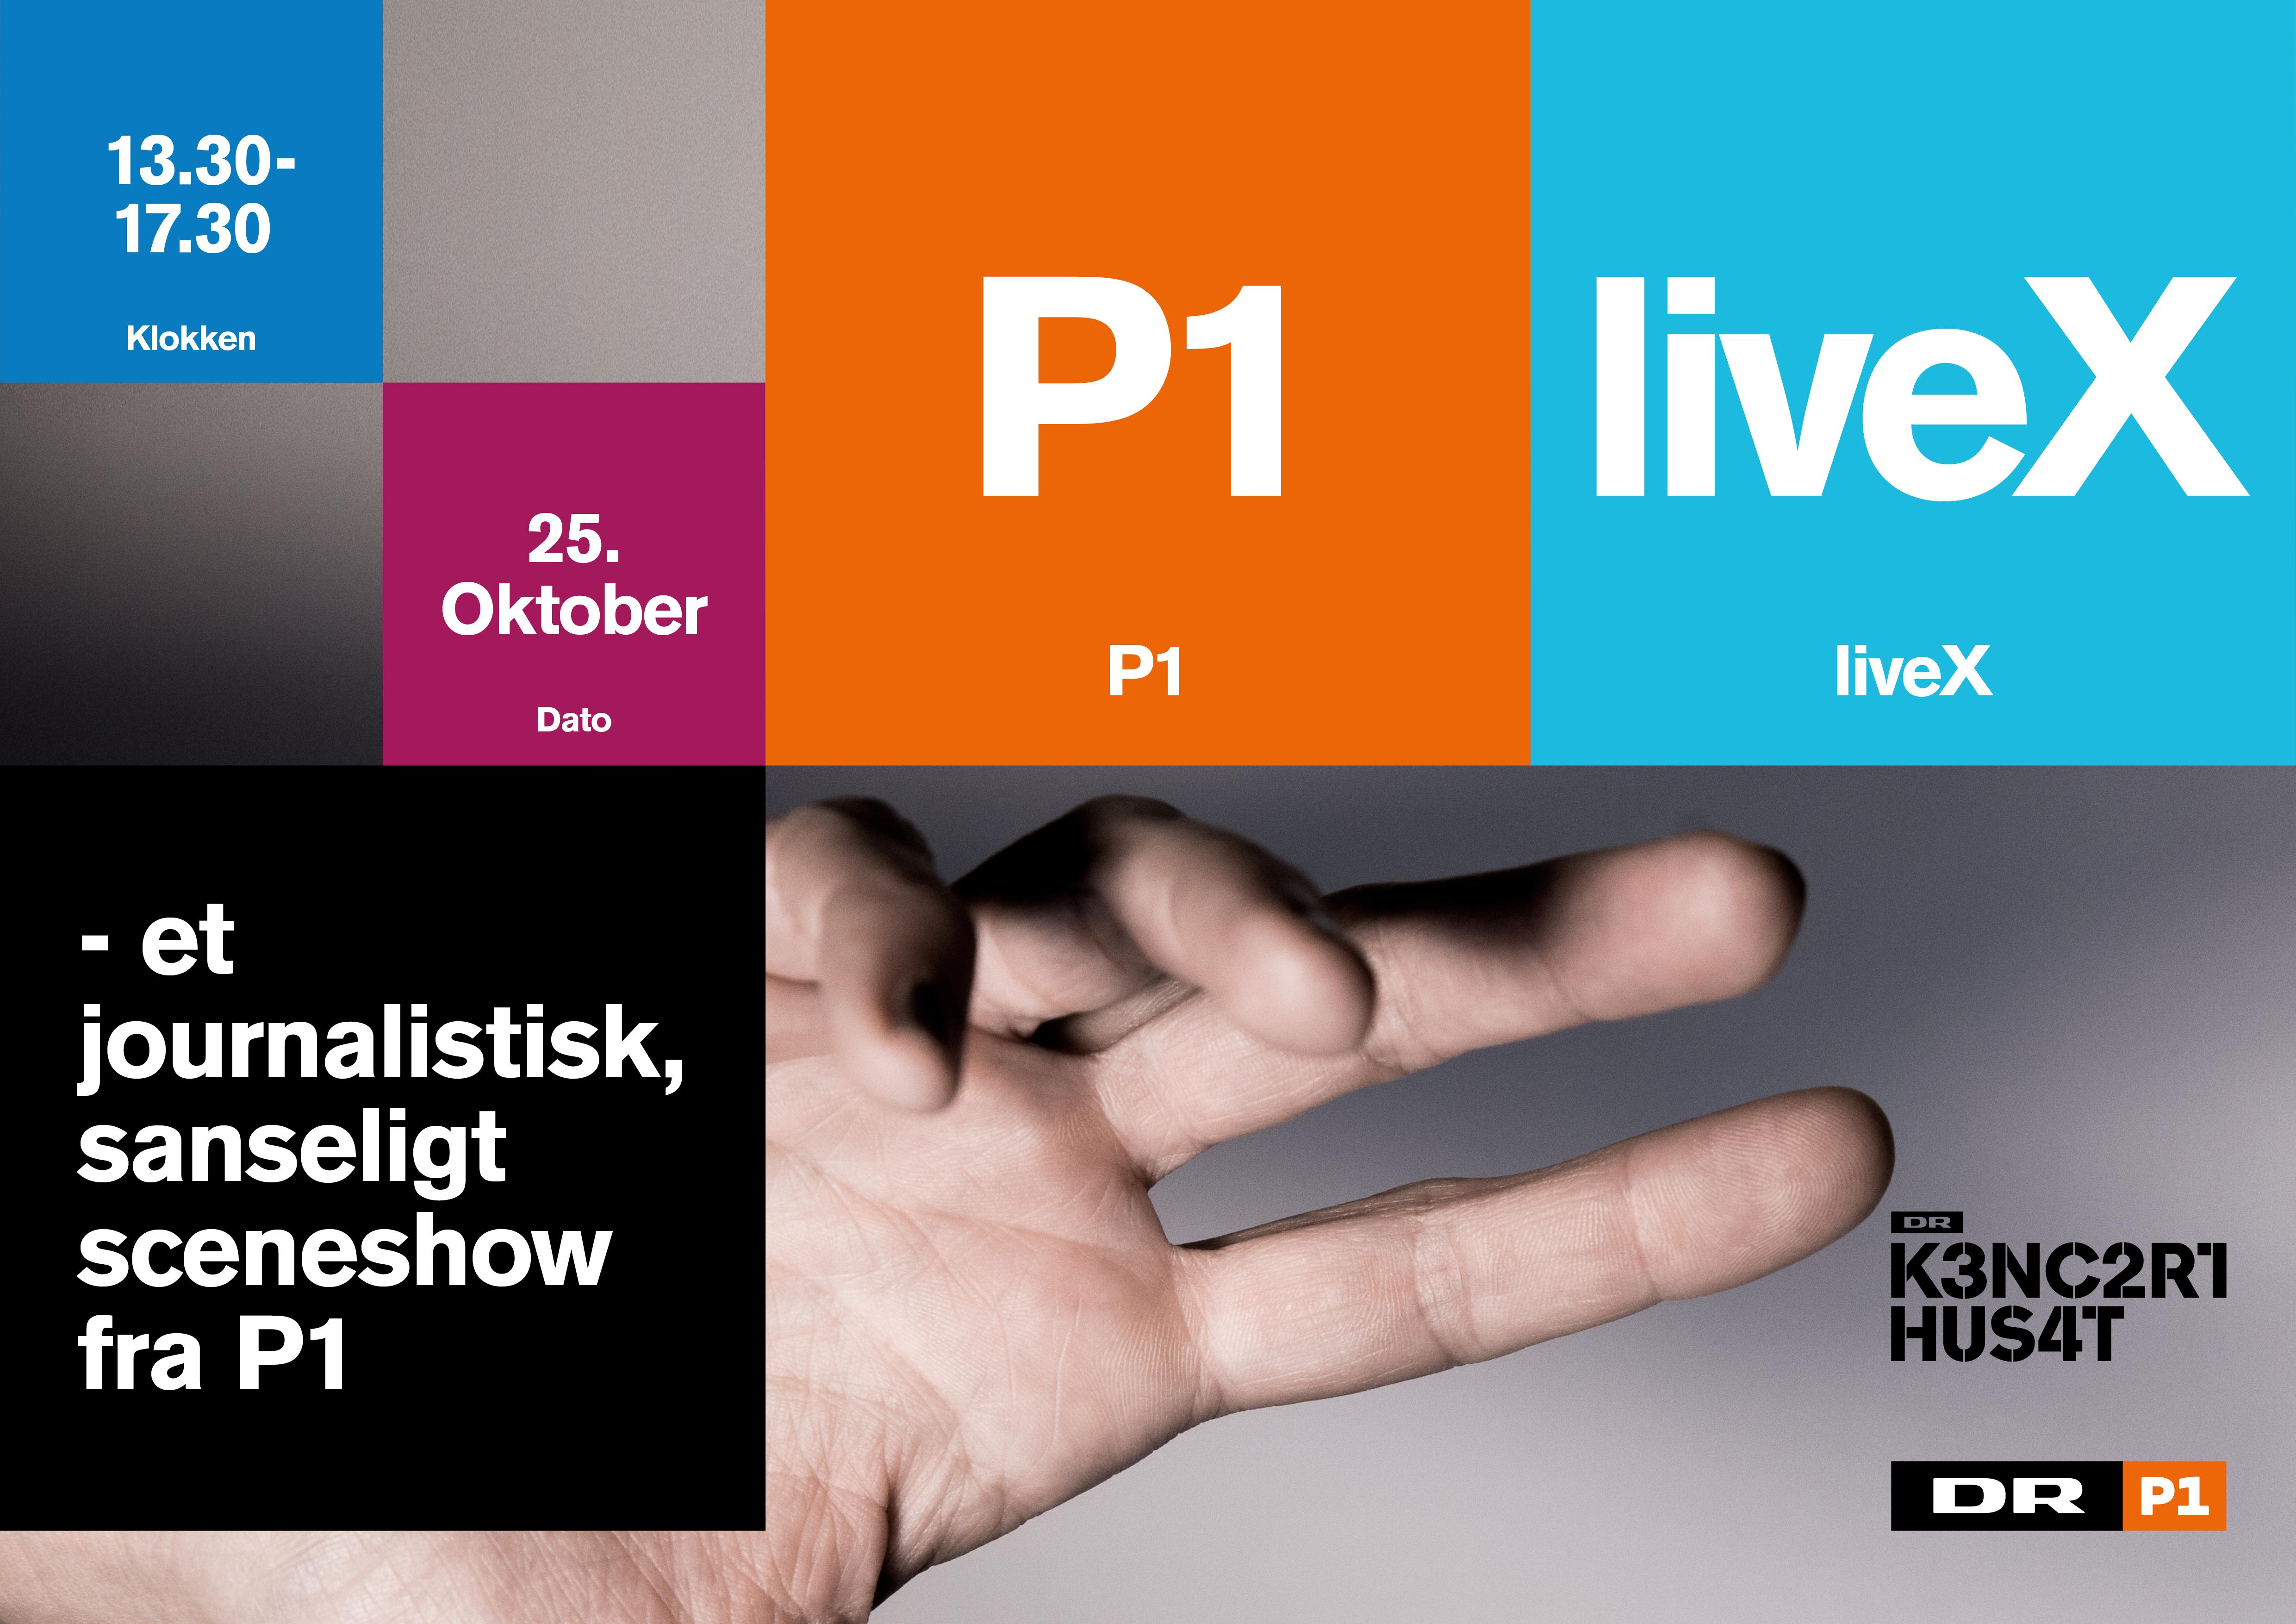 P1liveX